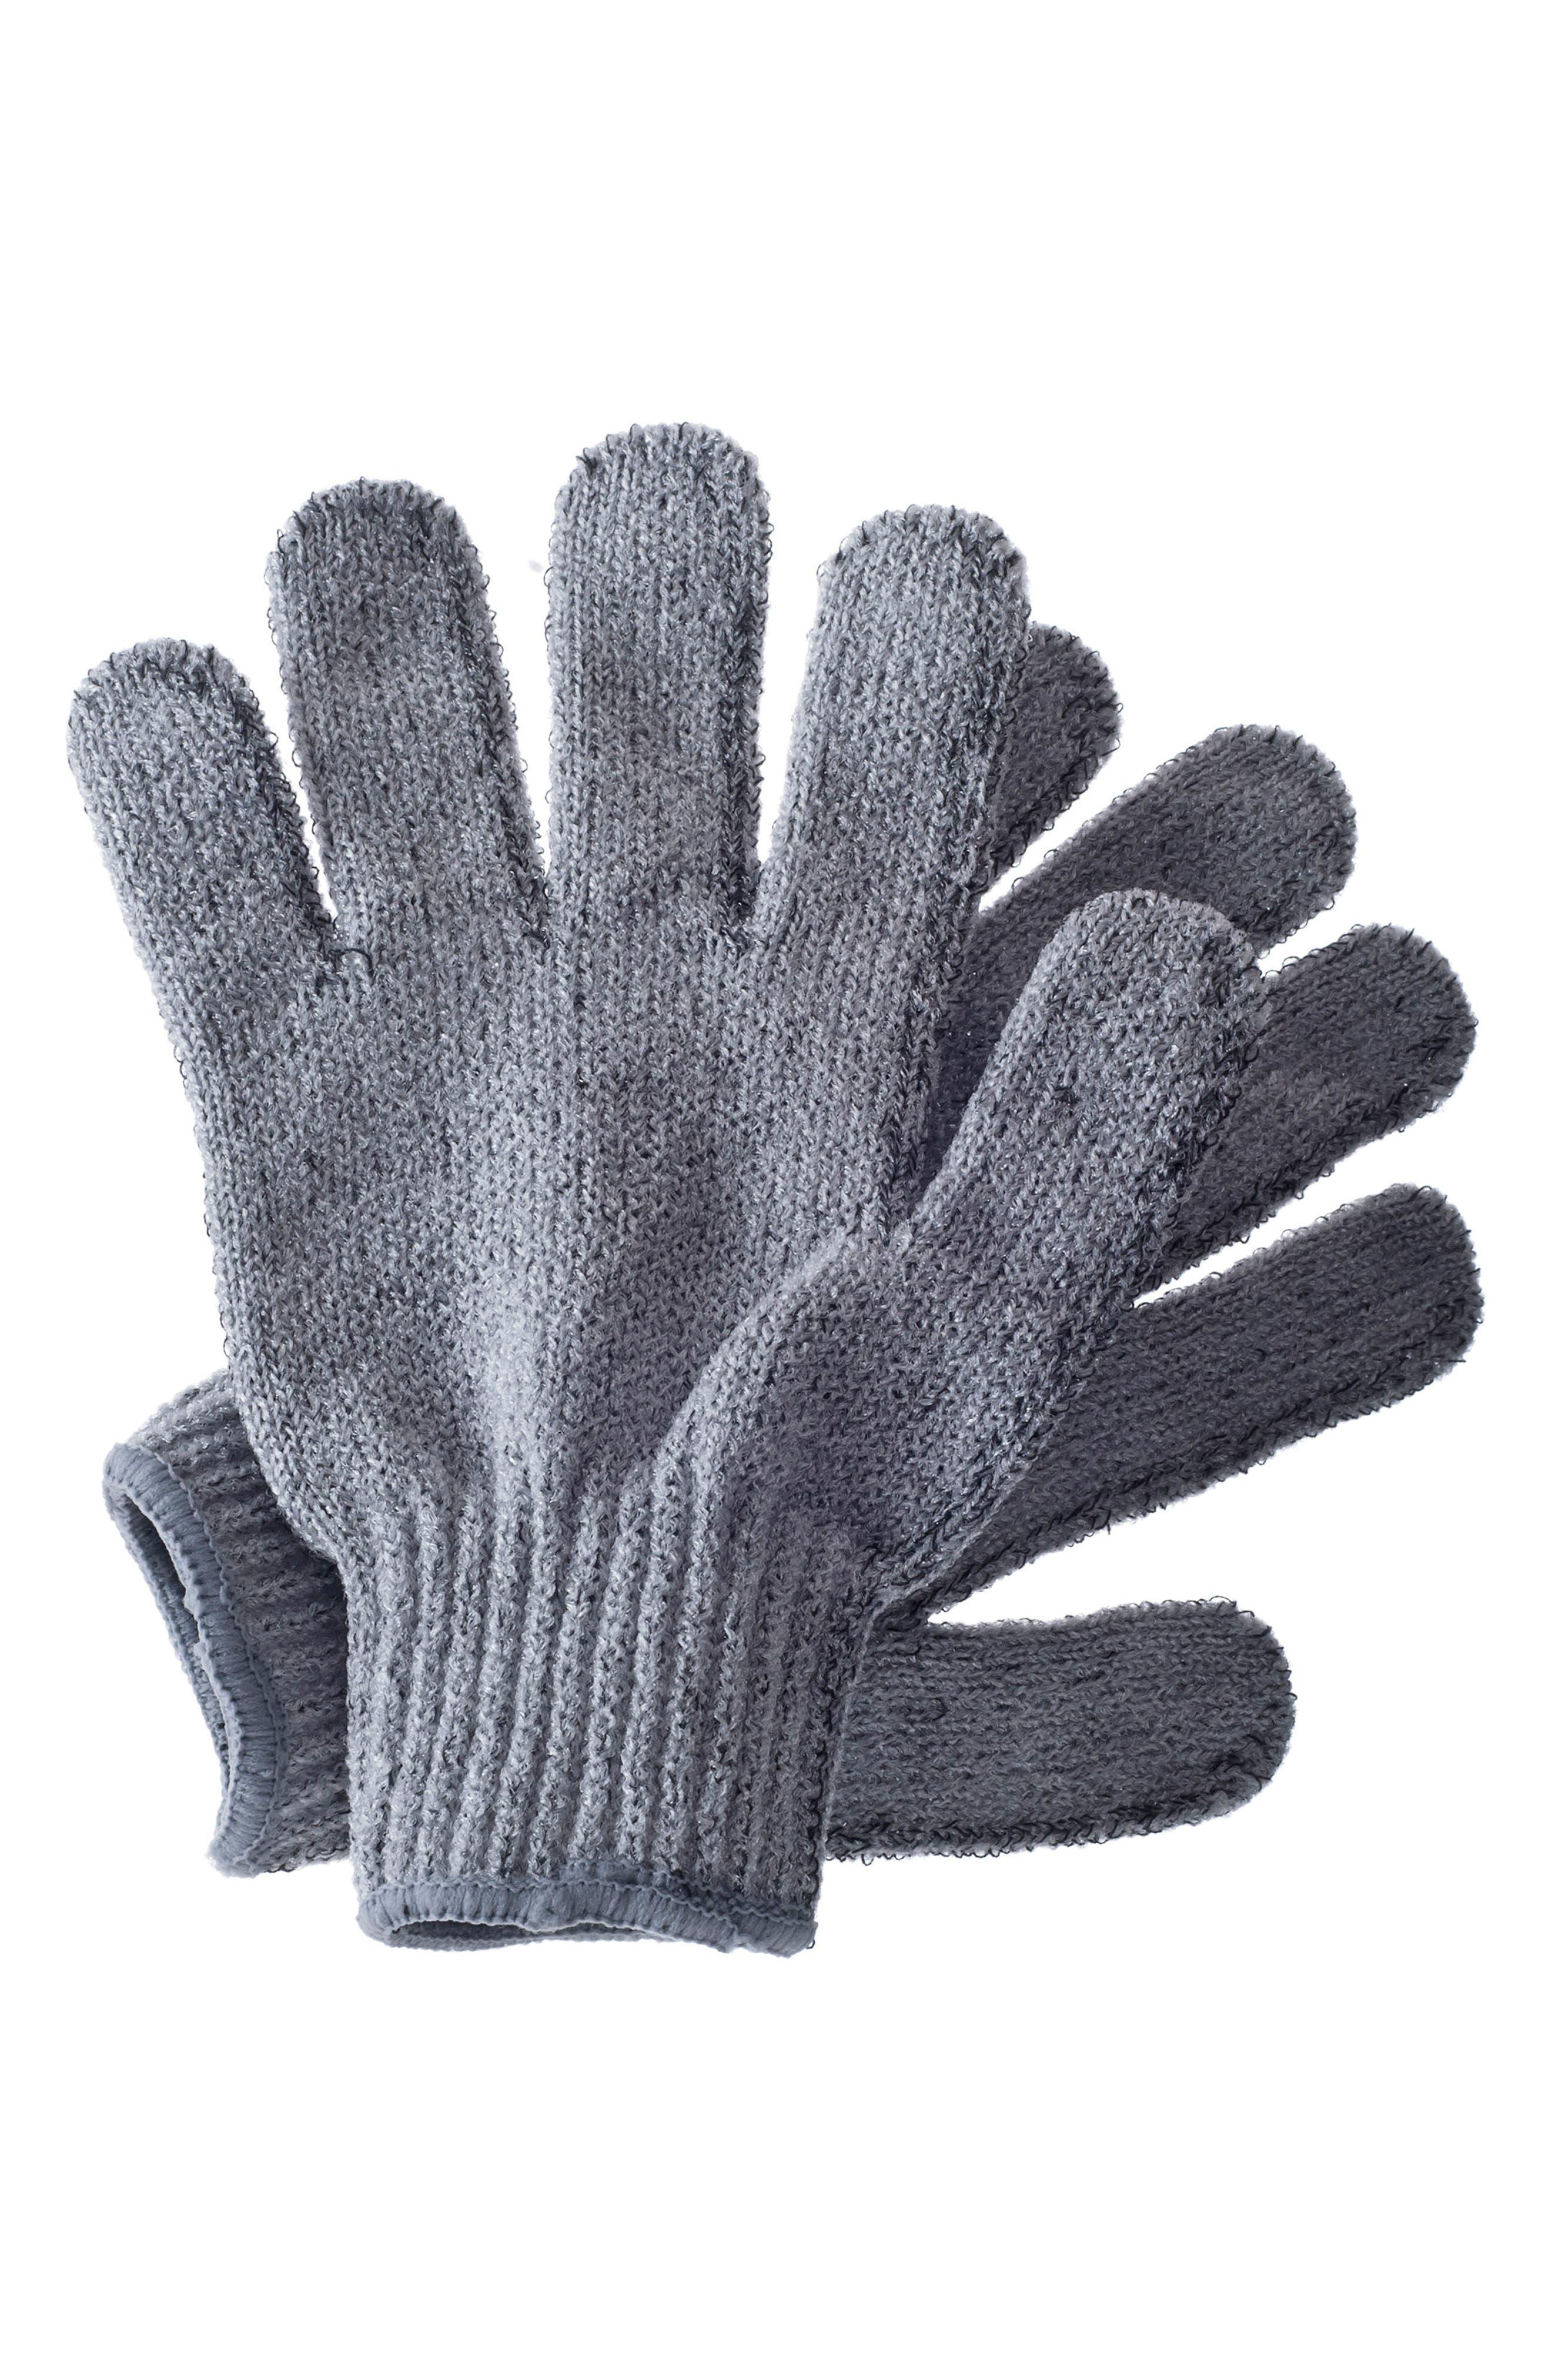 Carbonized Exfoliating Gloves,                             Main thumbnail 1, color,                             000